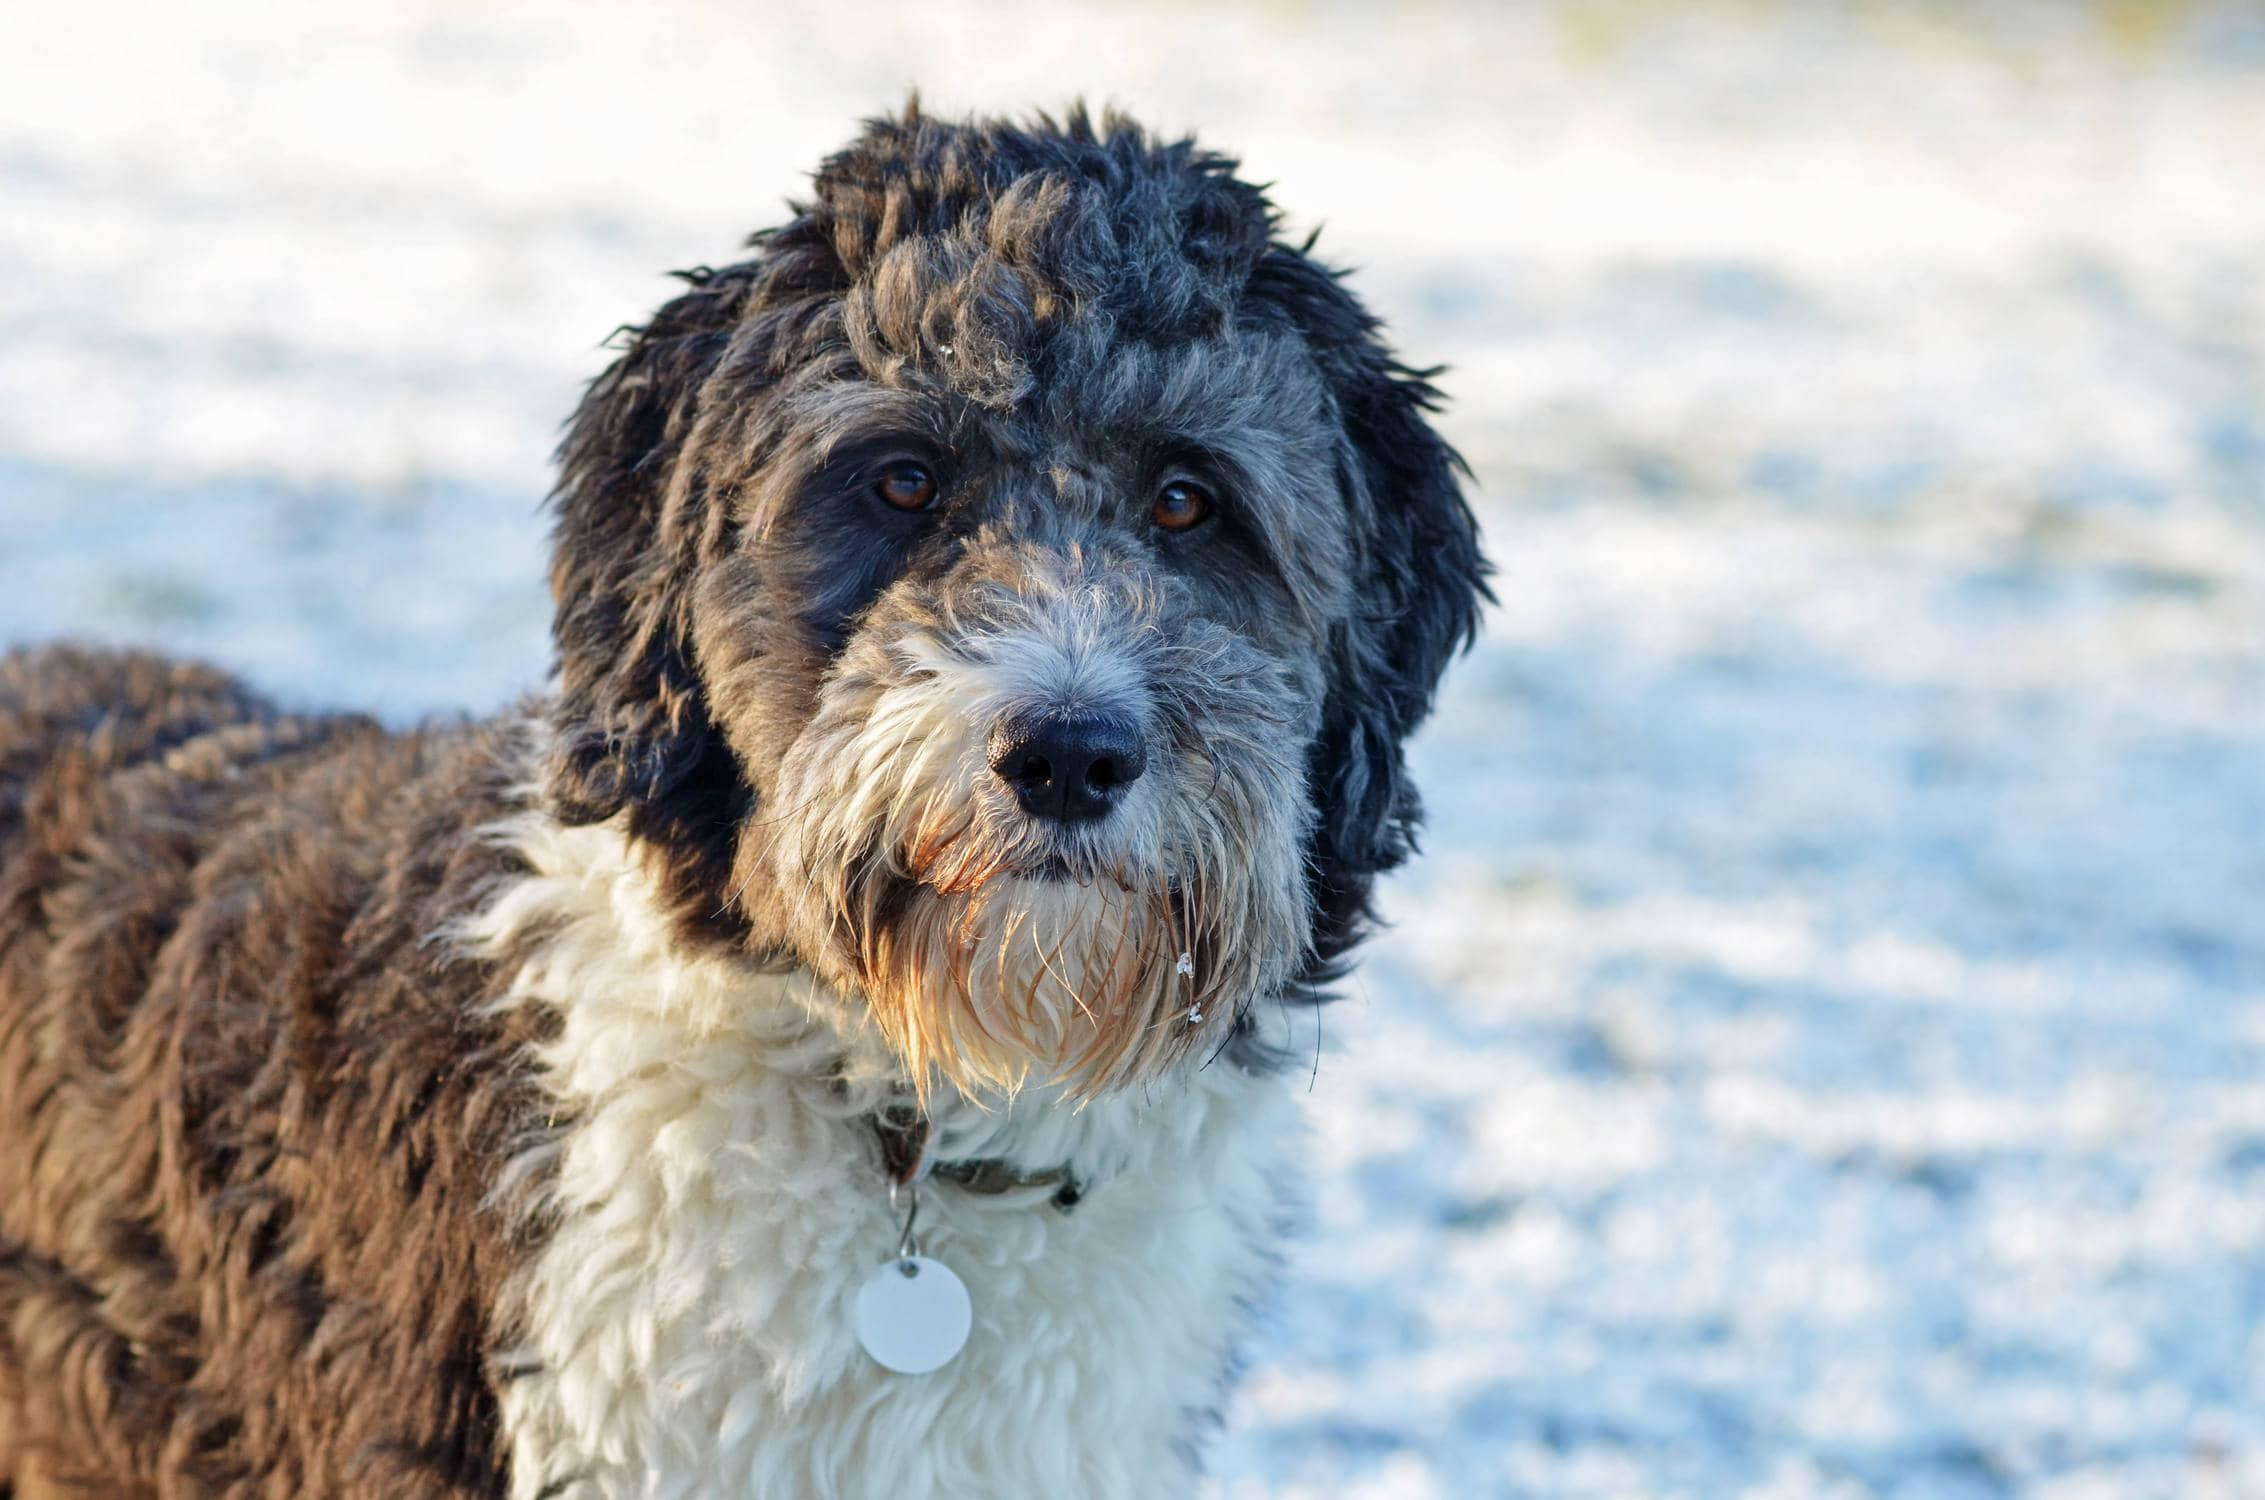 Neat Australian Shepherd Poodle Mix Behaviour Breeds Archives Page Practical Paw Dog Husky Poodle Mix Full Grown Husky Poodle Mix Dogs bark post Husky Poodle Mix